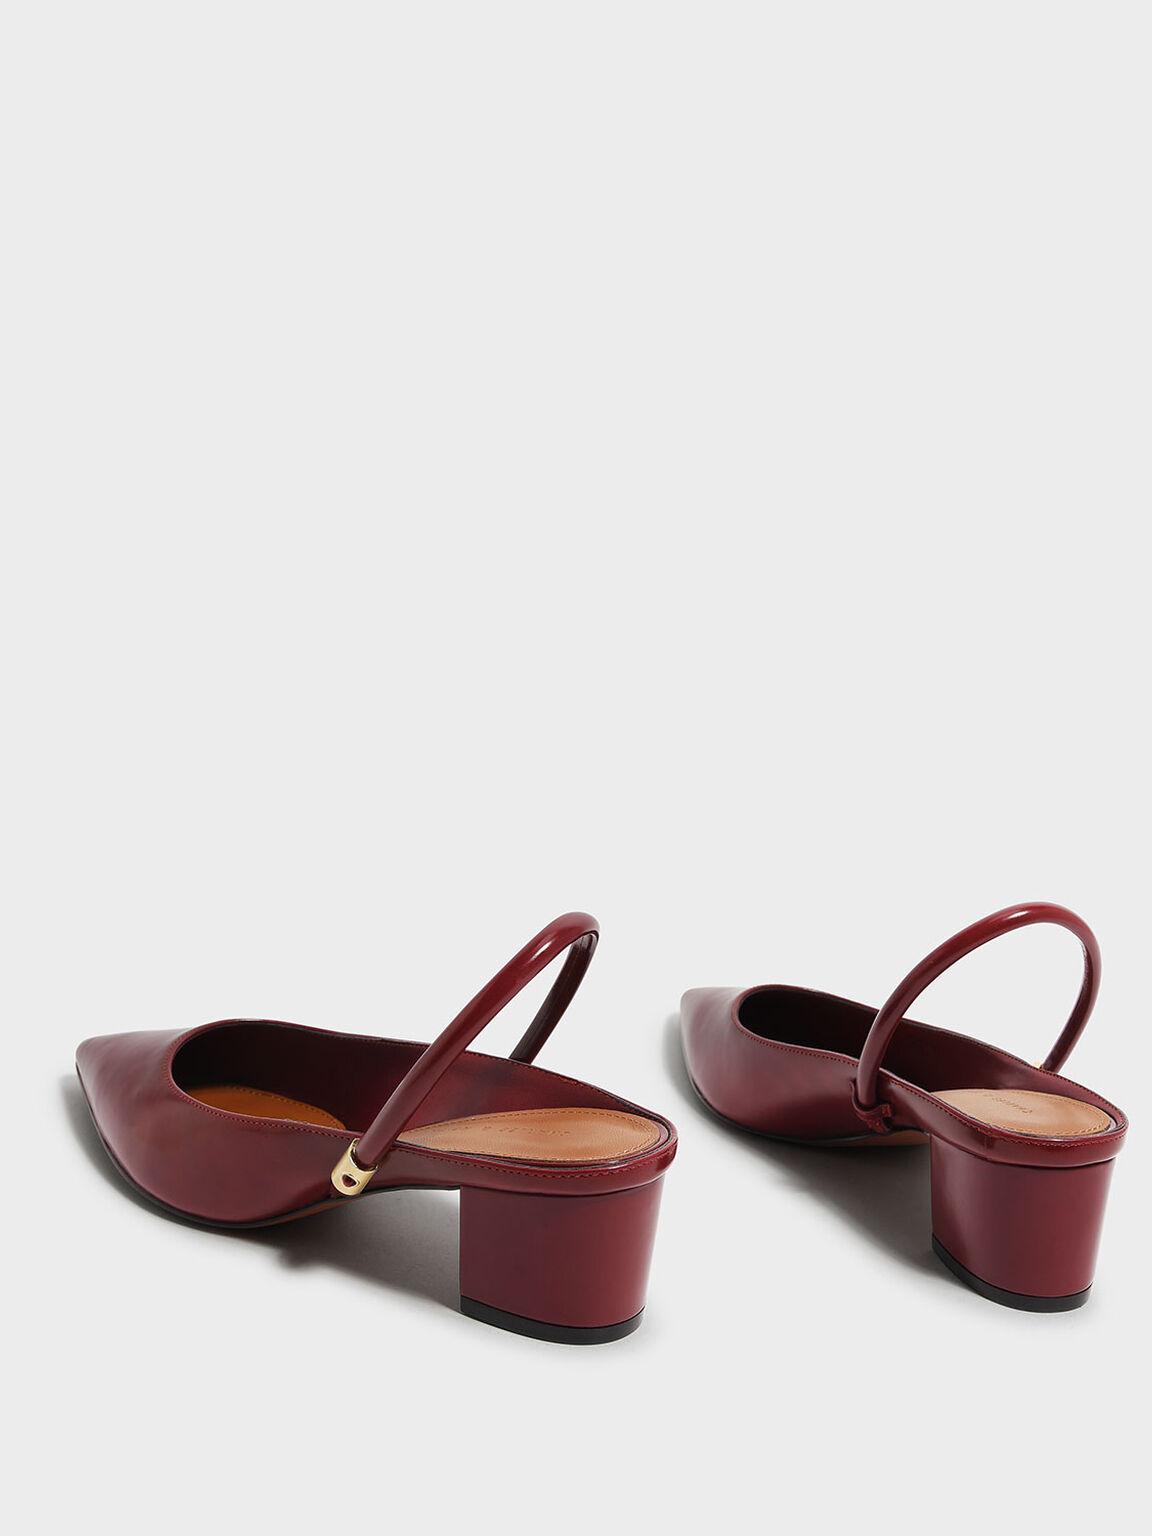 尖頭低跟鞋, 紅色, hi-res